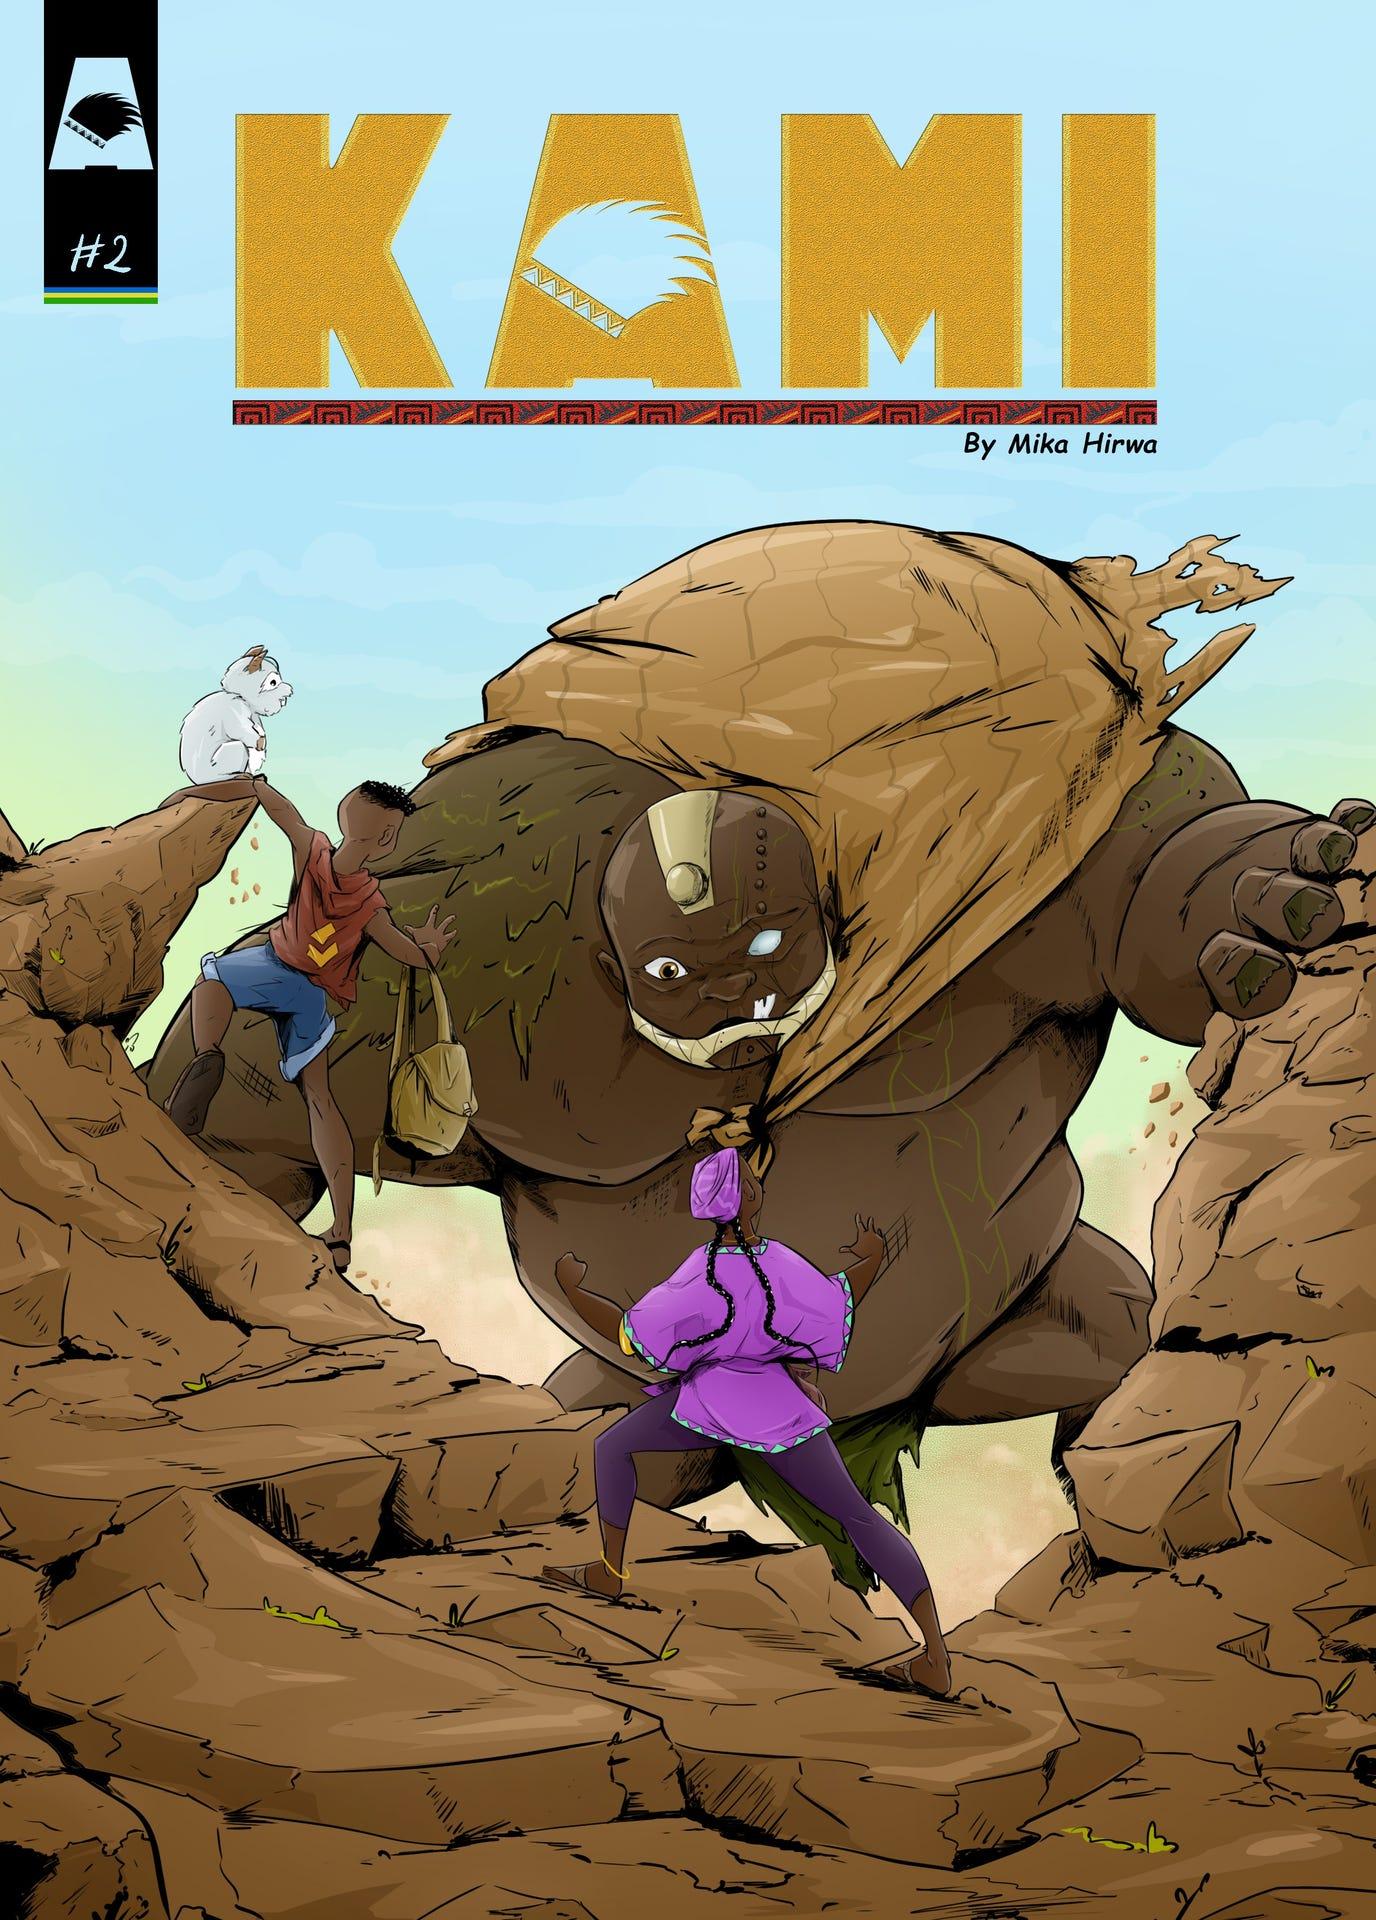 Kami Rwandan comic by Mika Hirwa